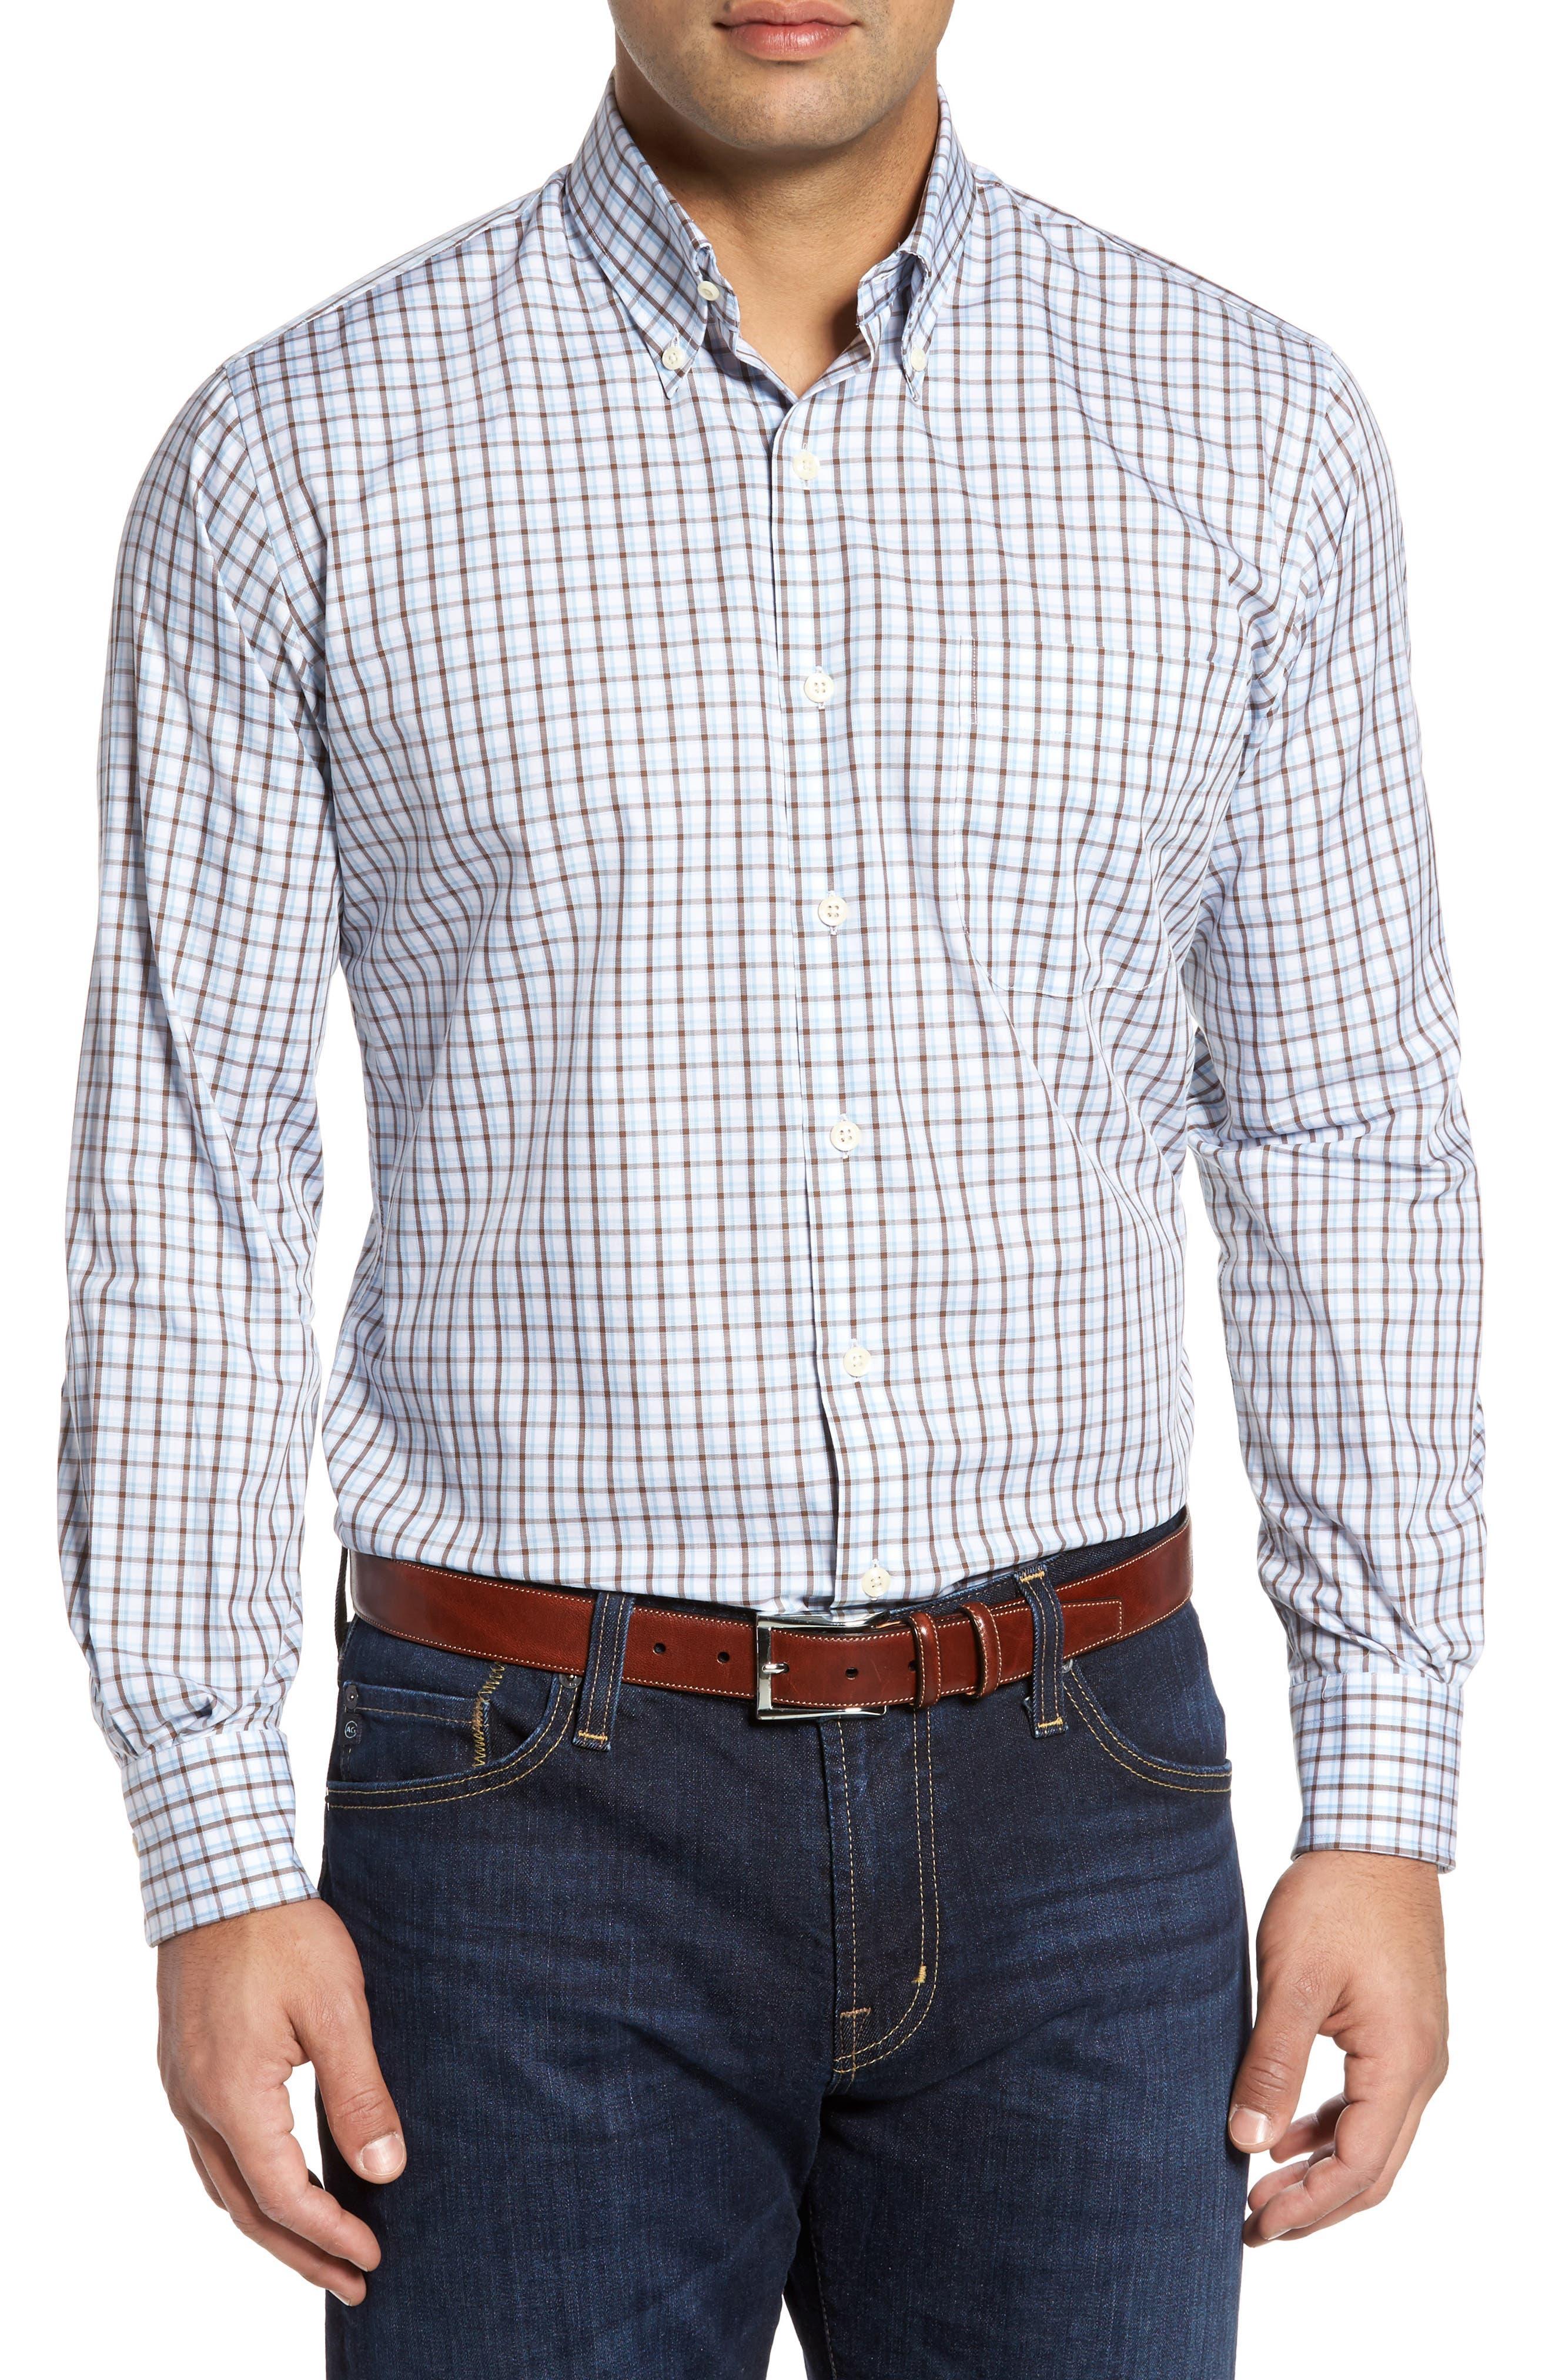 Alternate Image 1 Selected - Peter Millar Regular Fit Crisp Pane Sport Shirt